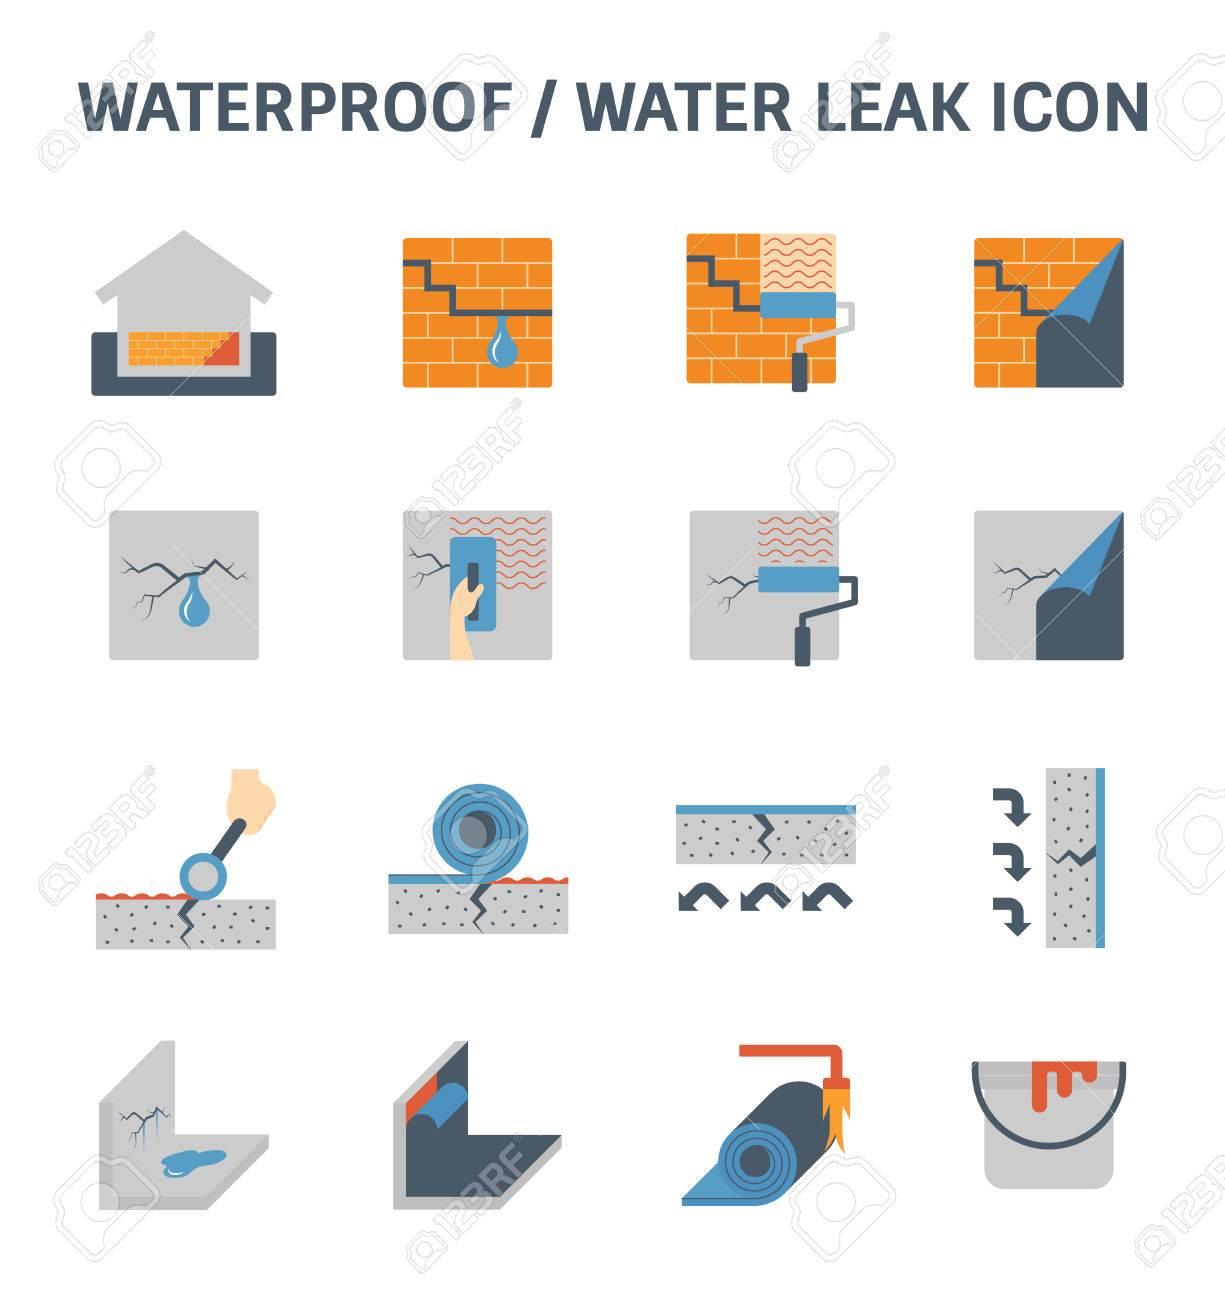 Waterproofing and water leak vector icon set design. - 80041415